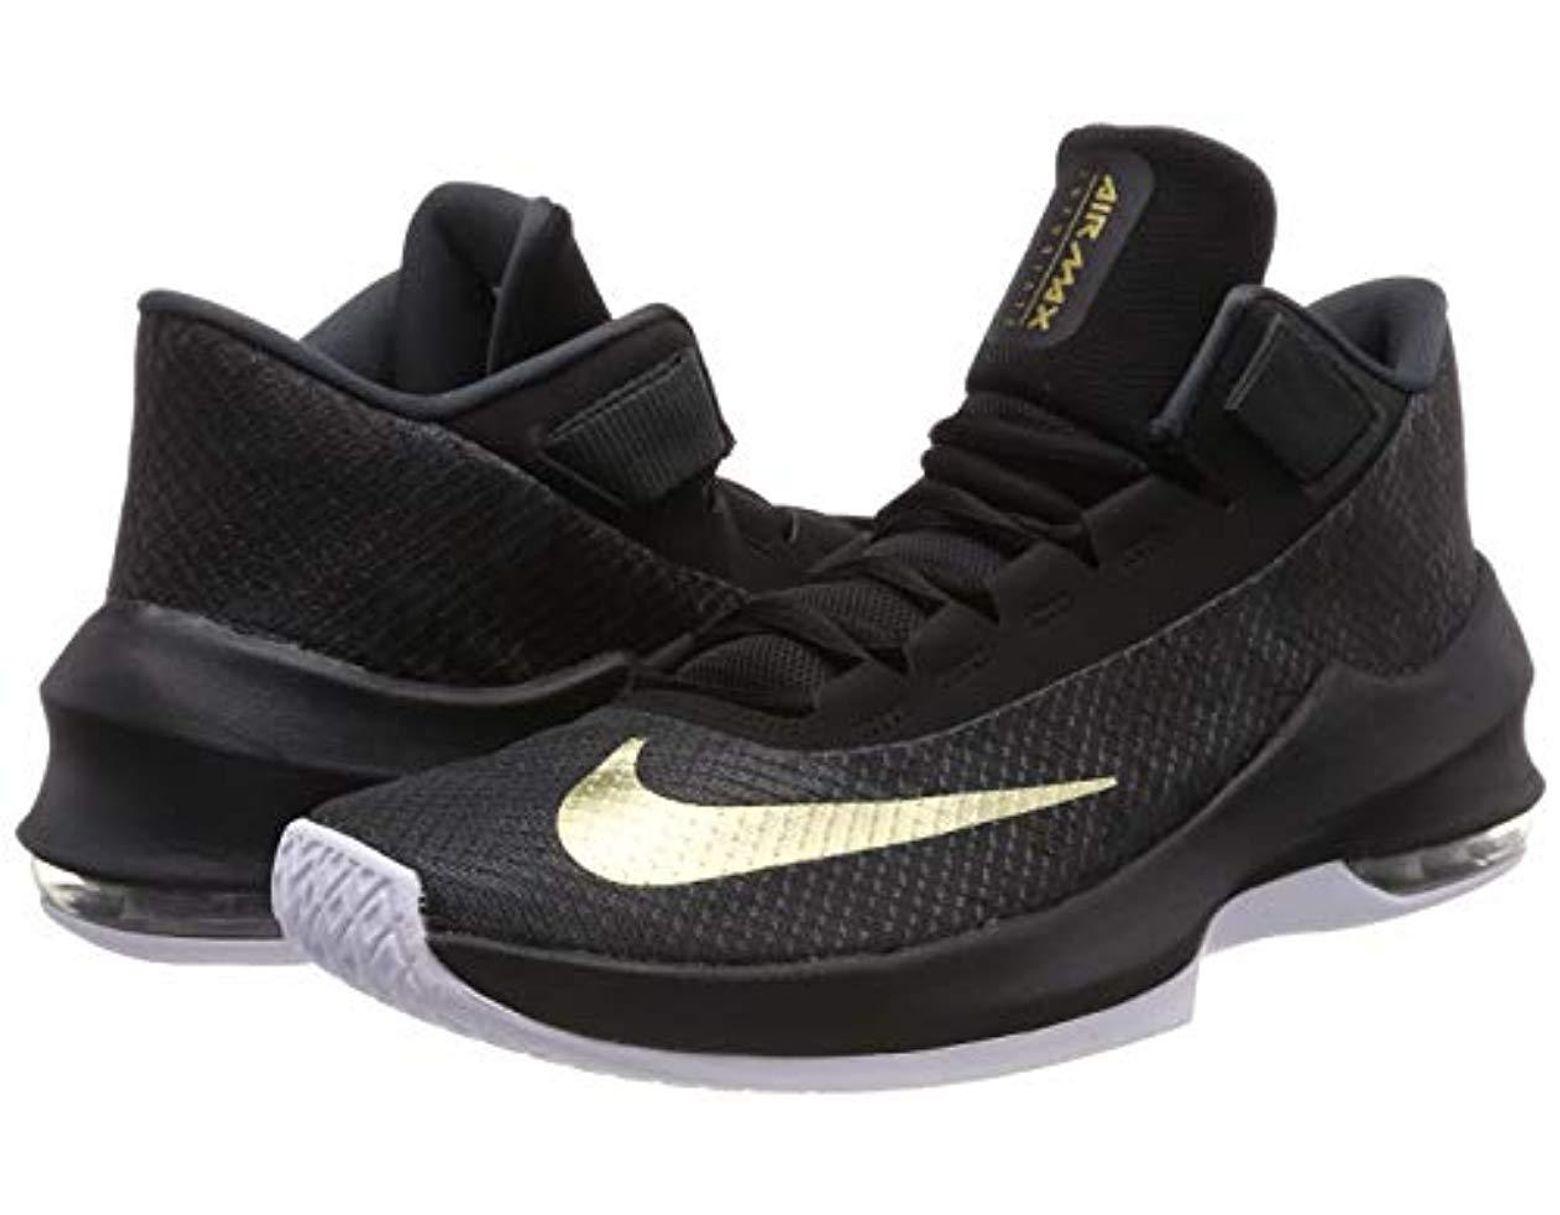 31a4dbd515744 Men's Black Air Max Infuriate 2 Mid Basketball Shoes